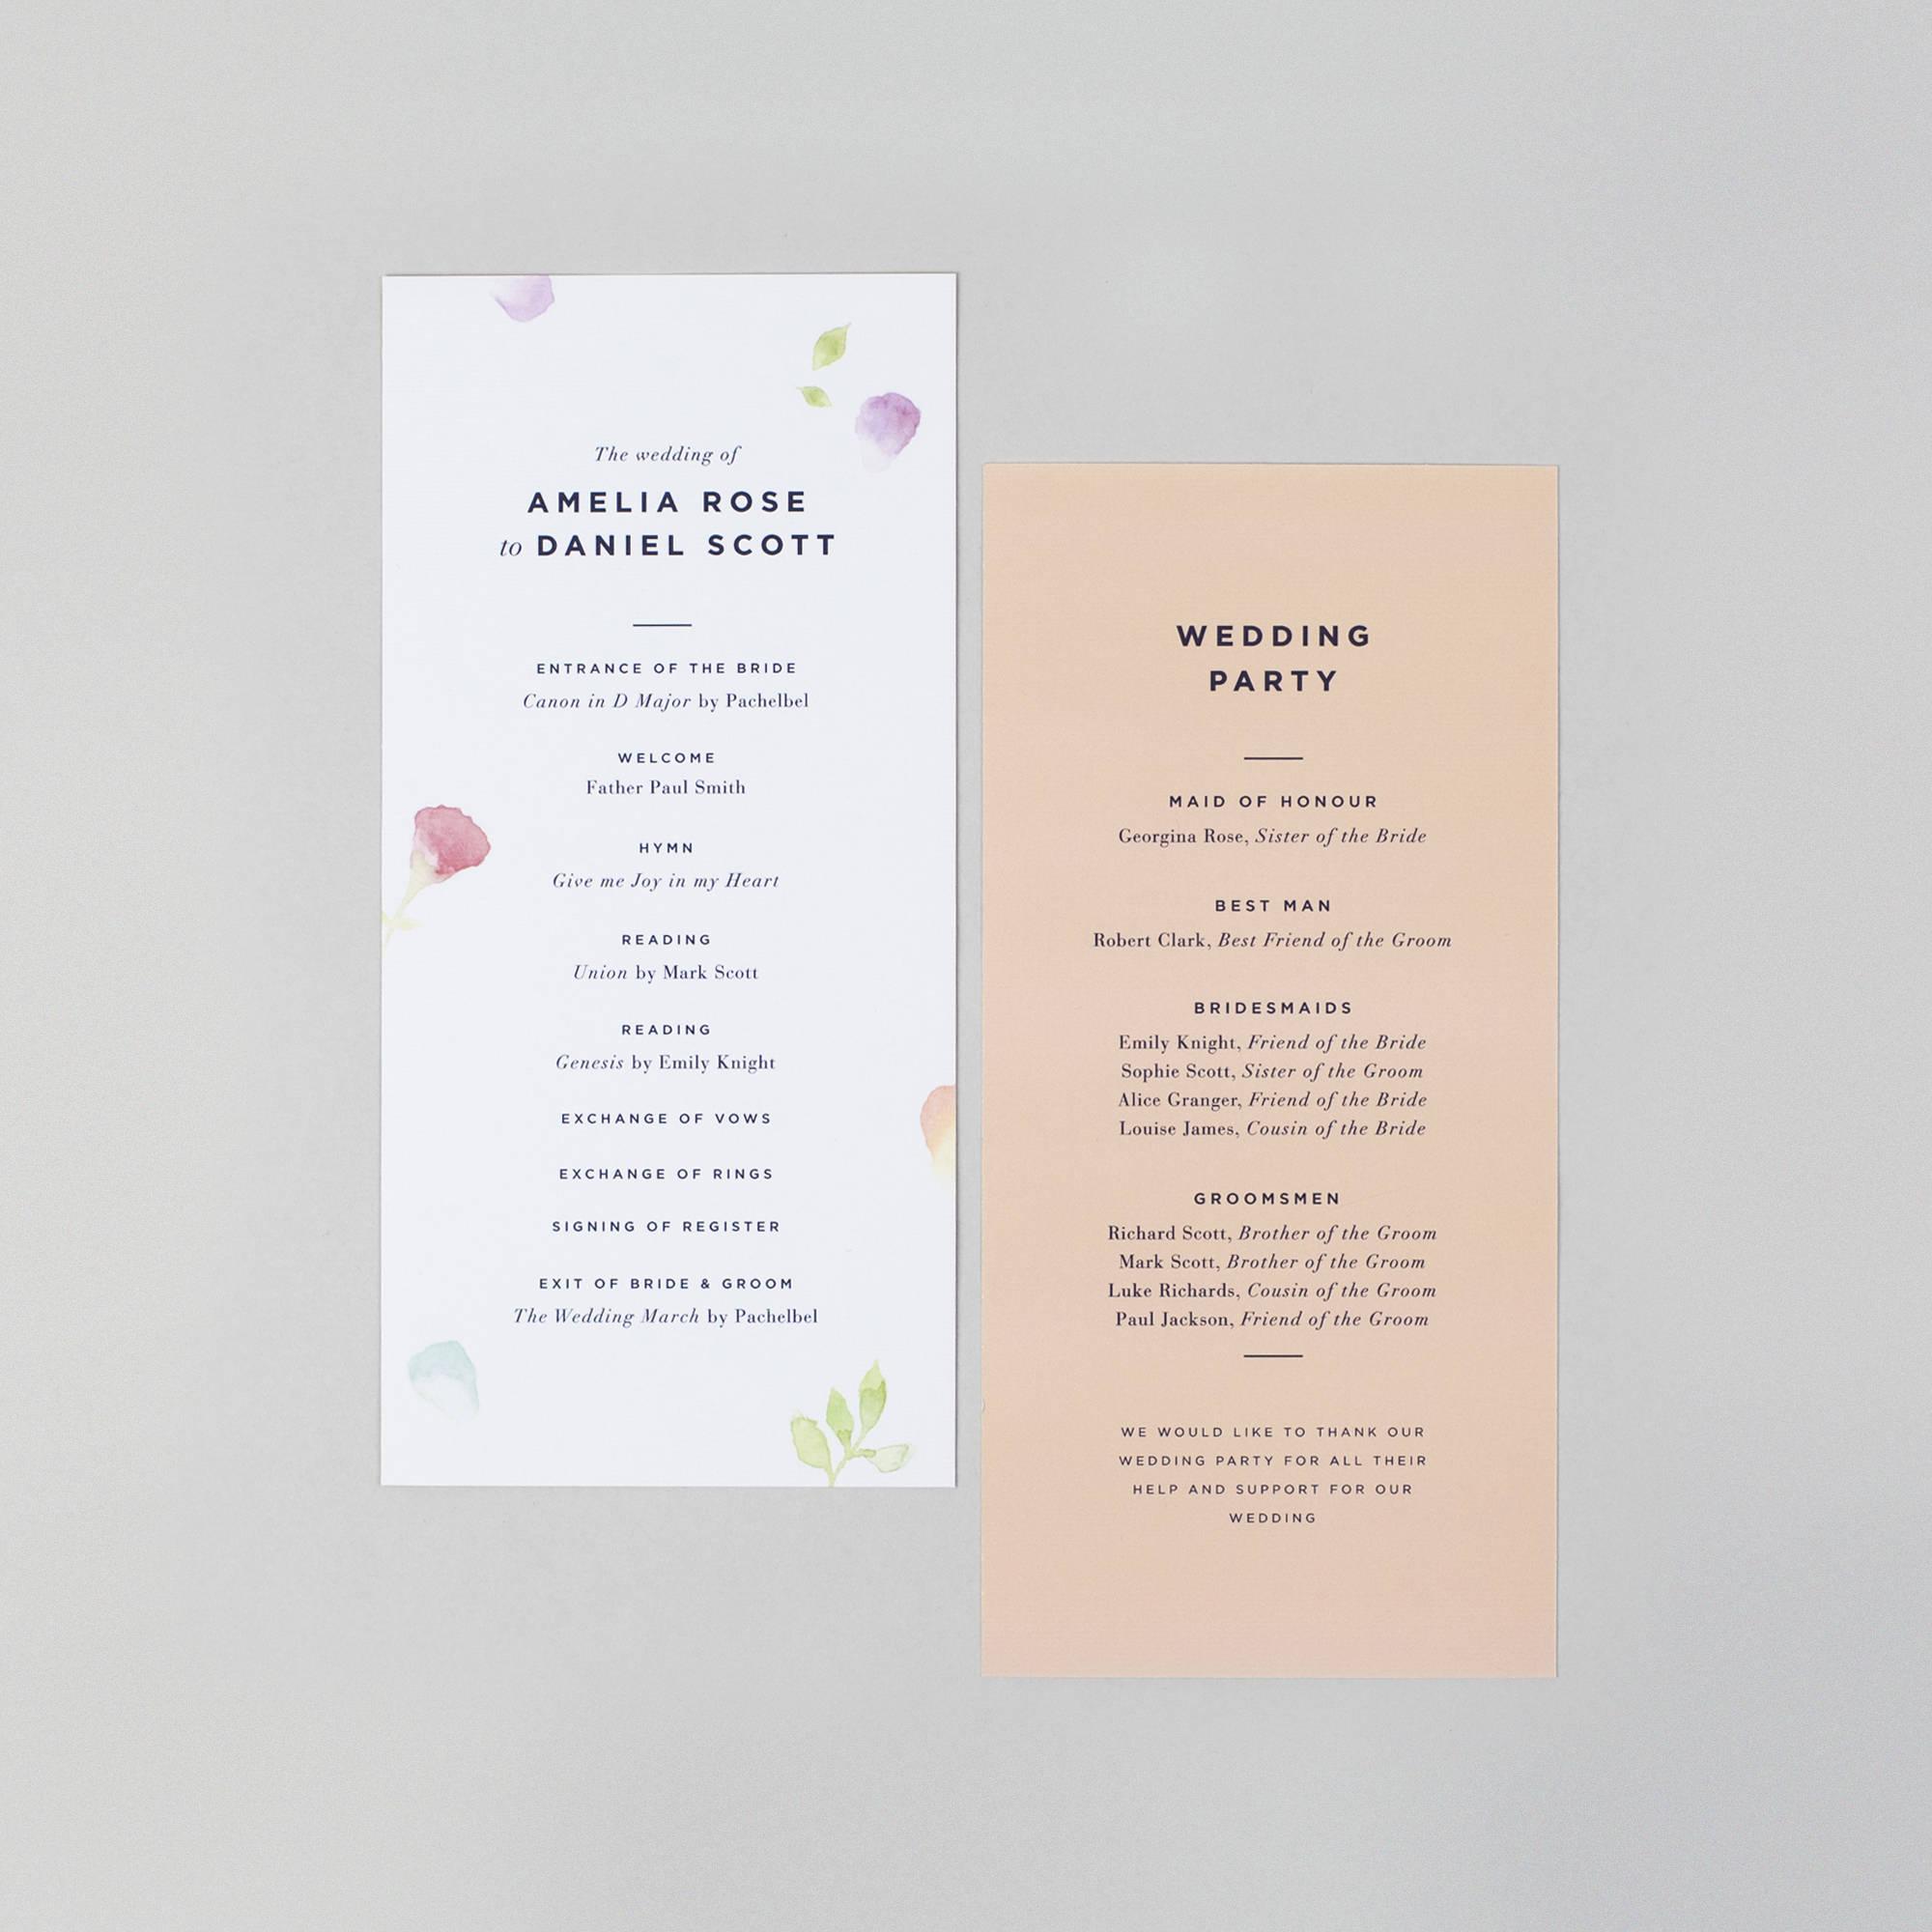 Wedding Order Of Service.Amelia Wedding Order Of Service Card Floral Wedding Programme Card Watercolour Wedding Order Of Service Wedding Invitations